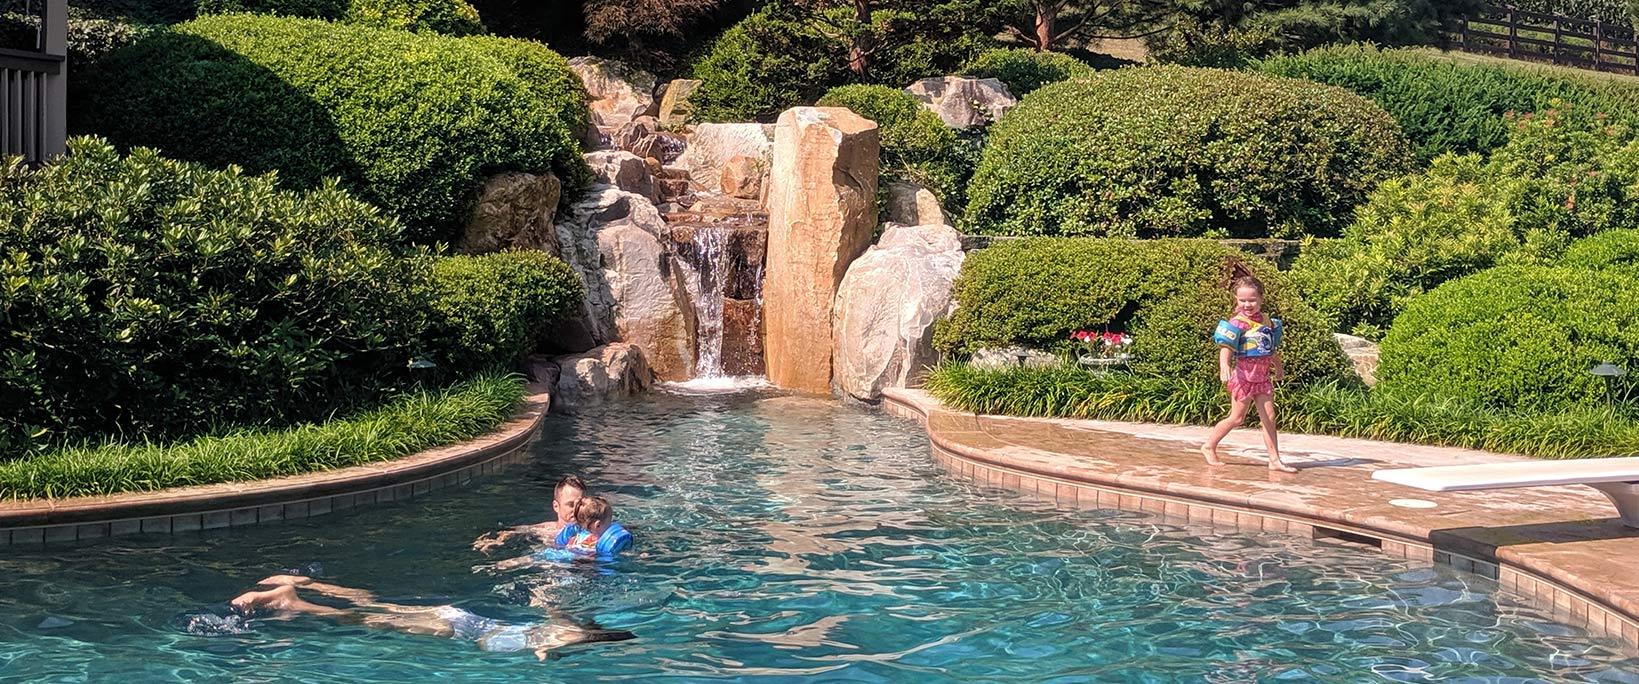 Swimming Pools & Gardens poolsheader2